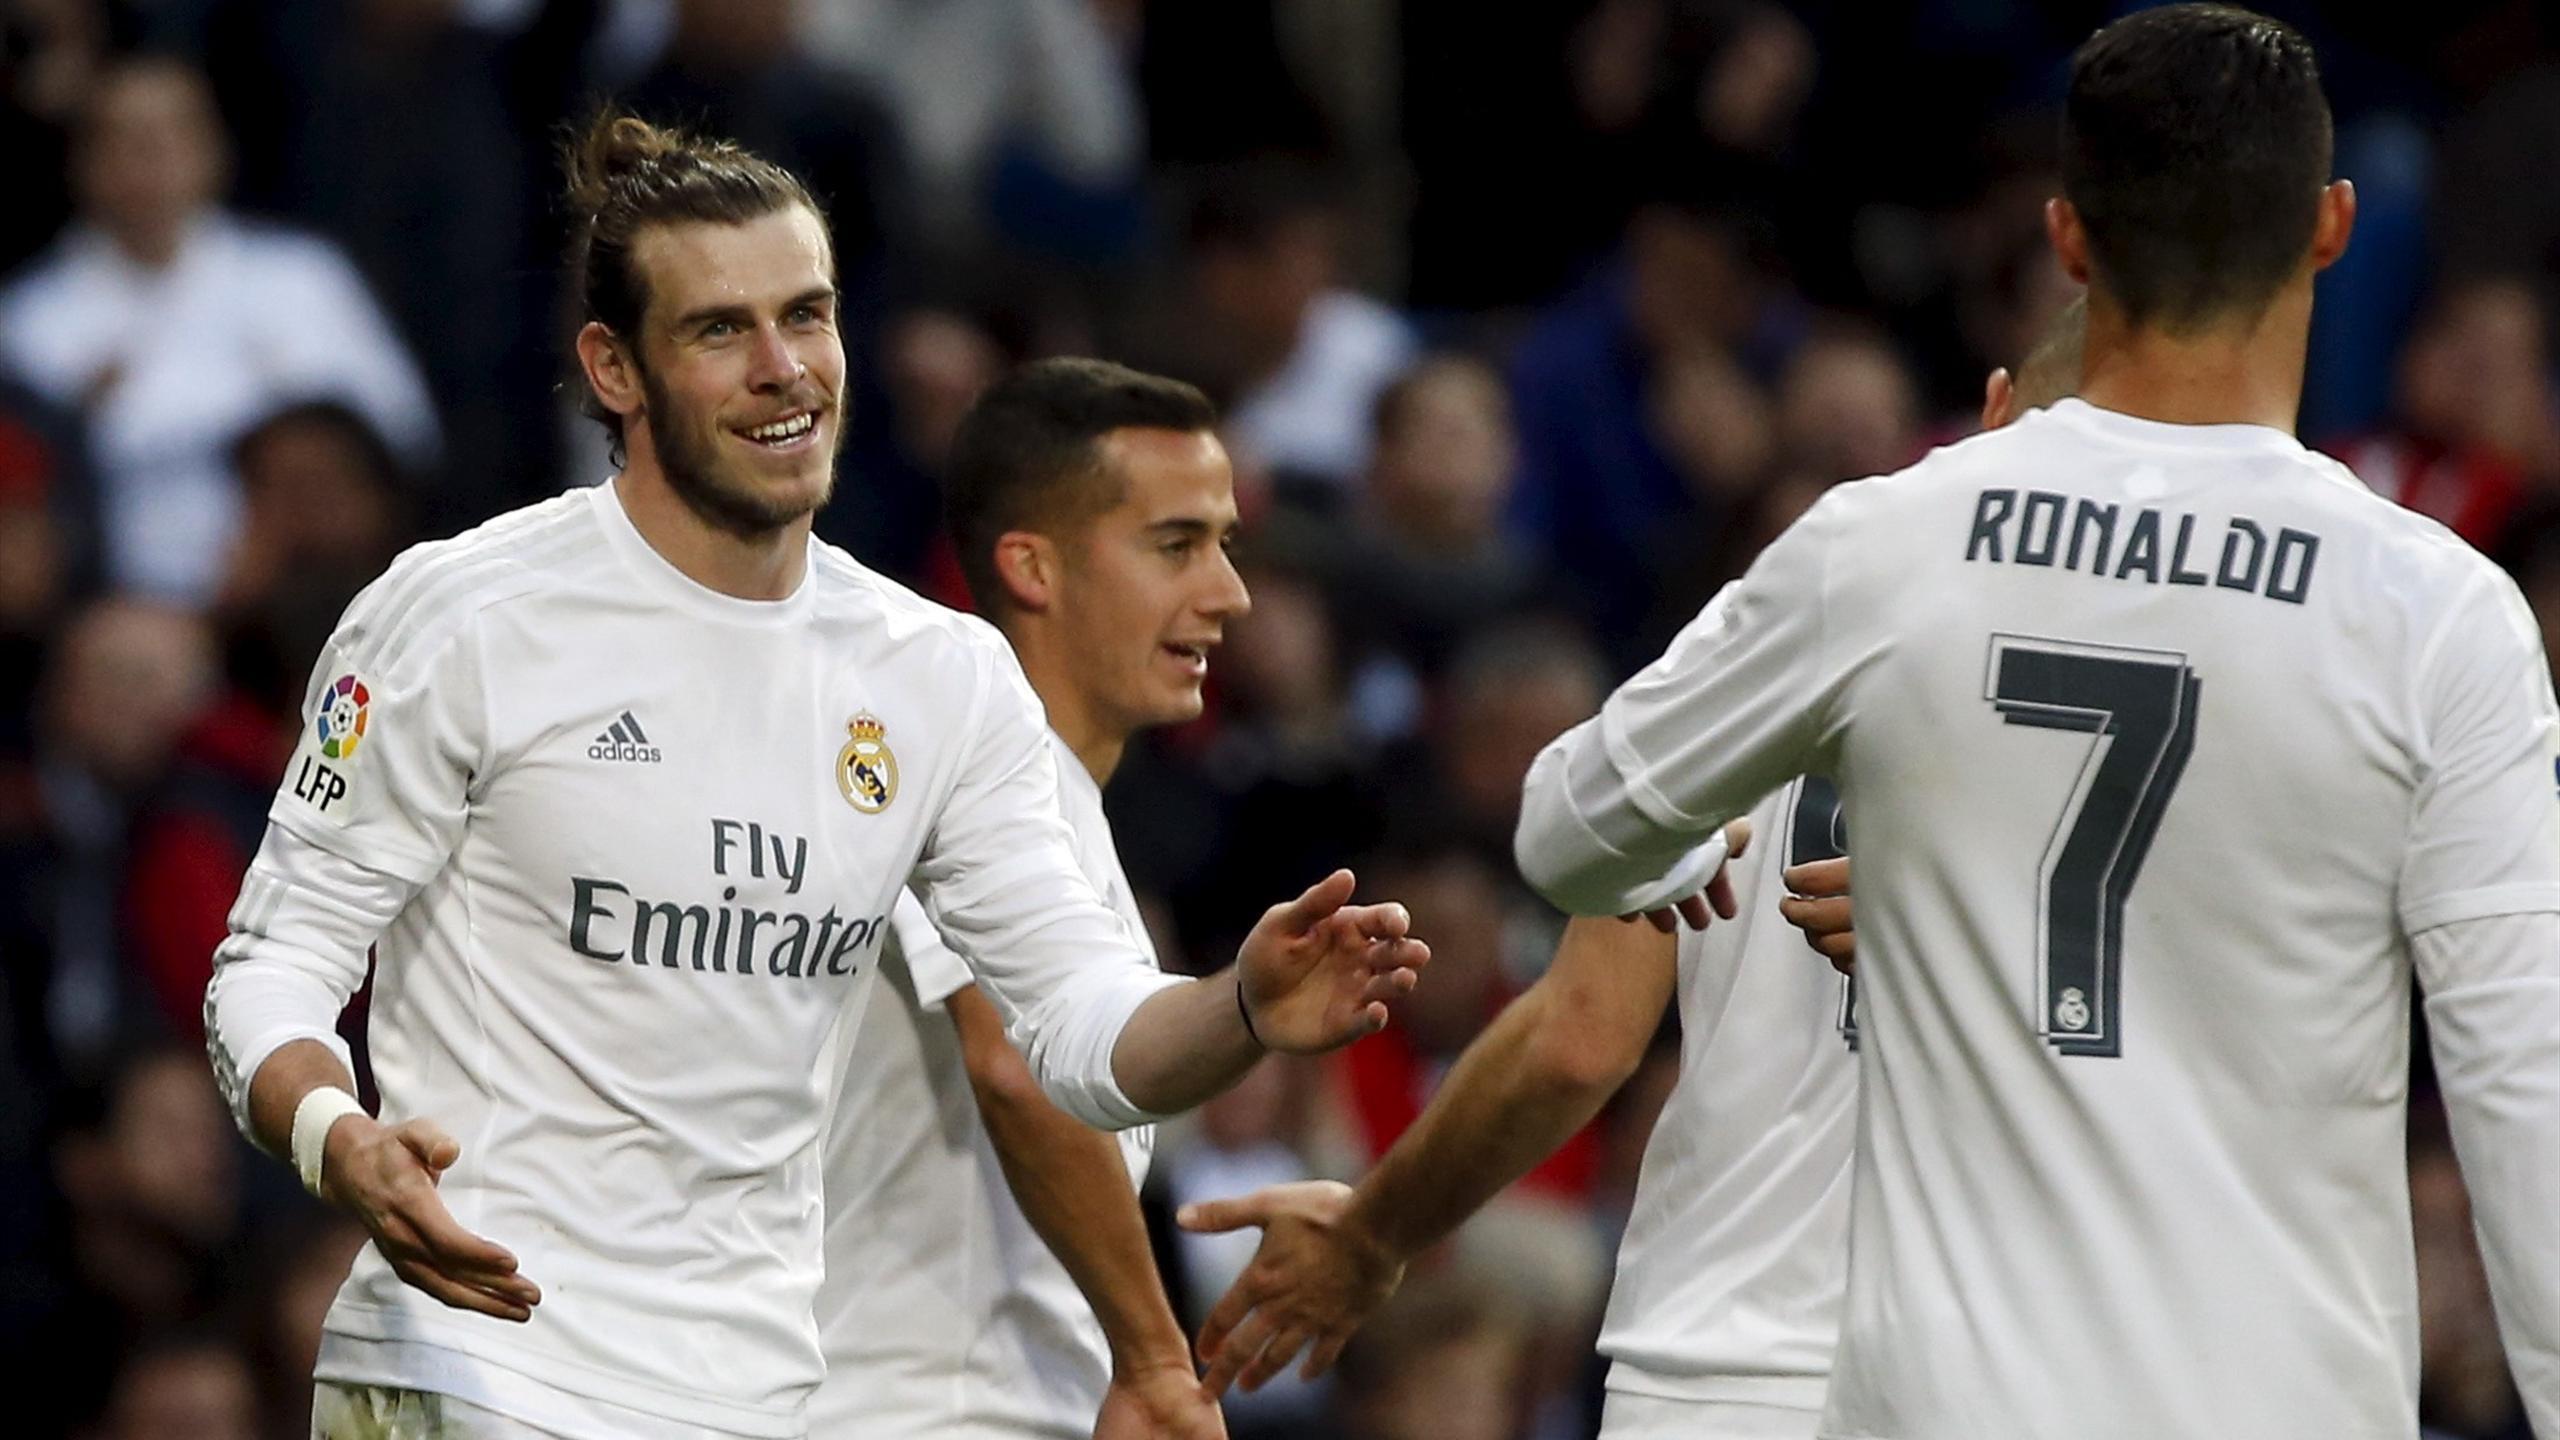 Real Madrid's Gareth Bale celebrates his fourth goal with team-mate Cristiano Ronaldo